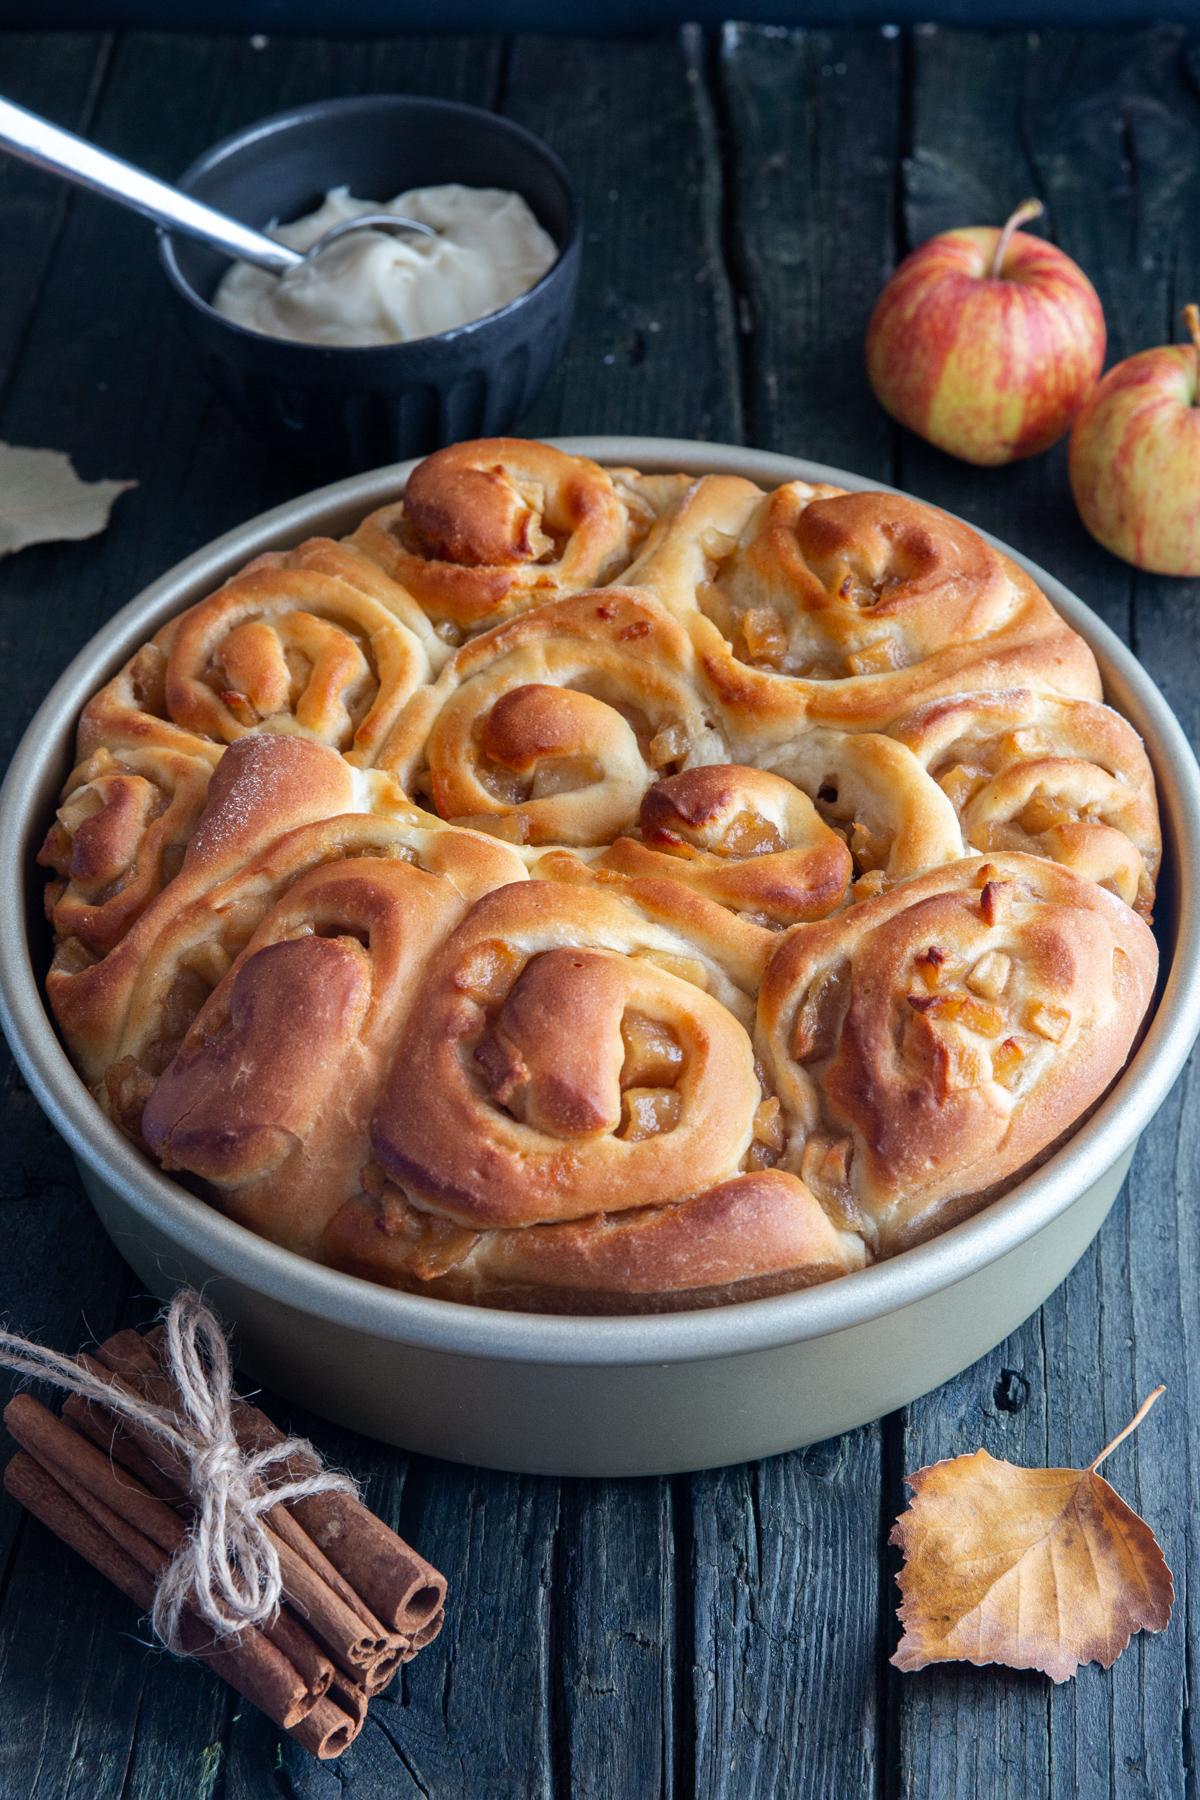 Cinnamon buns in a silver pan.